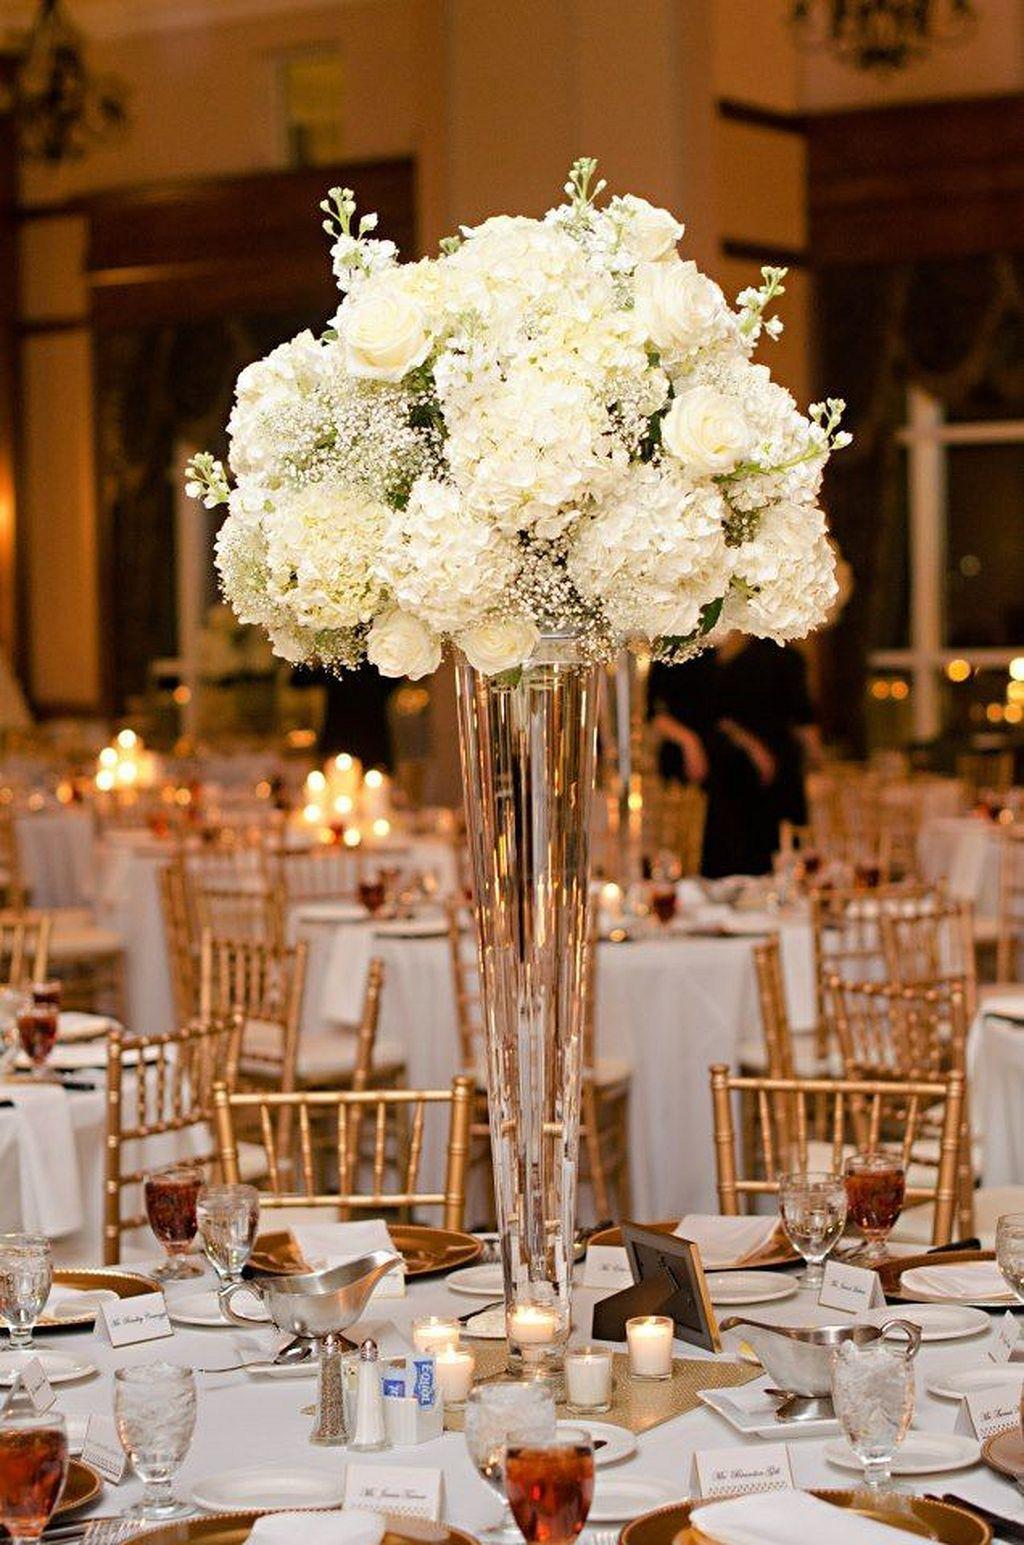 Wedding decorations on tables   elegant floral wedding centerpiece ideas   Floral wedding